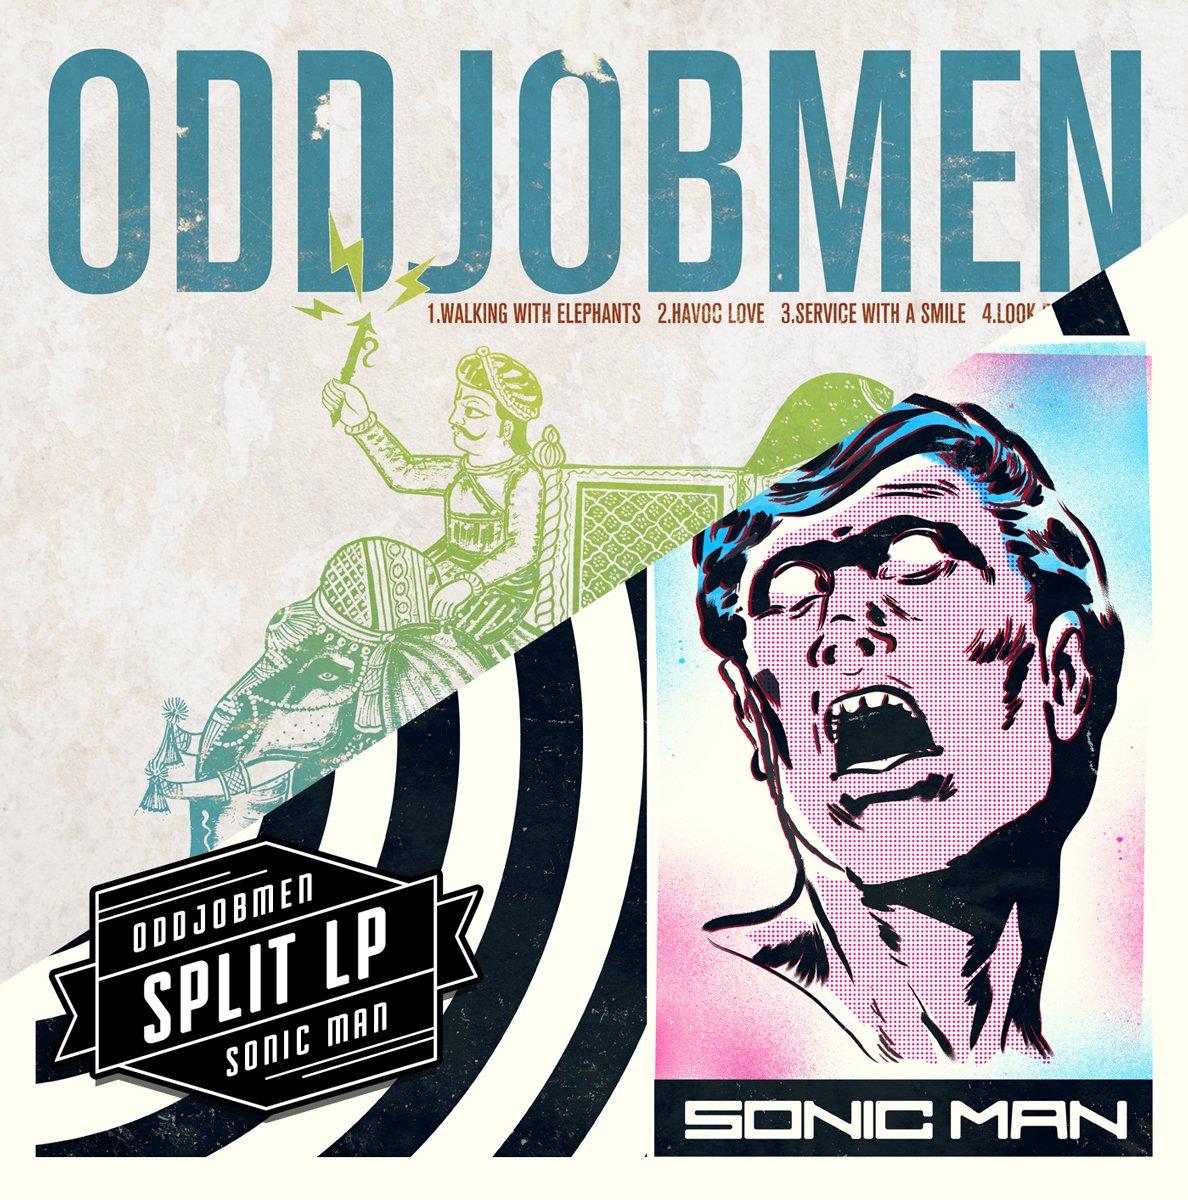 Oddjobmen, Sonic Man - Sonic Elephants (Split LP) (Color